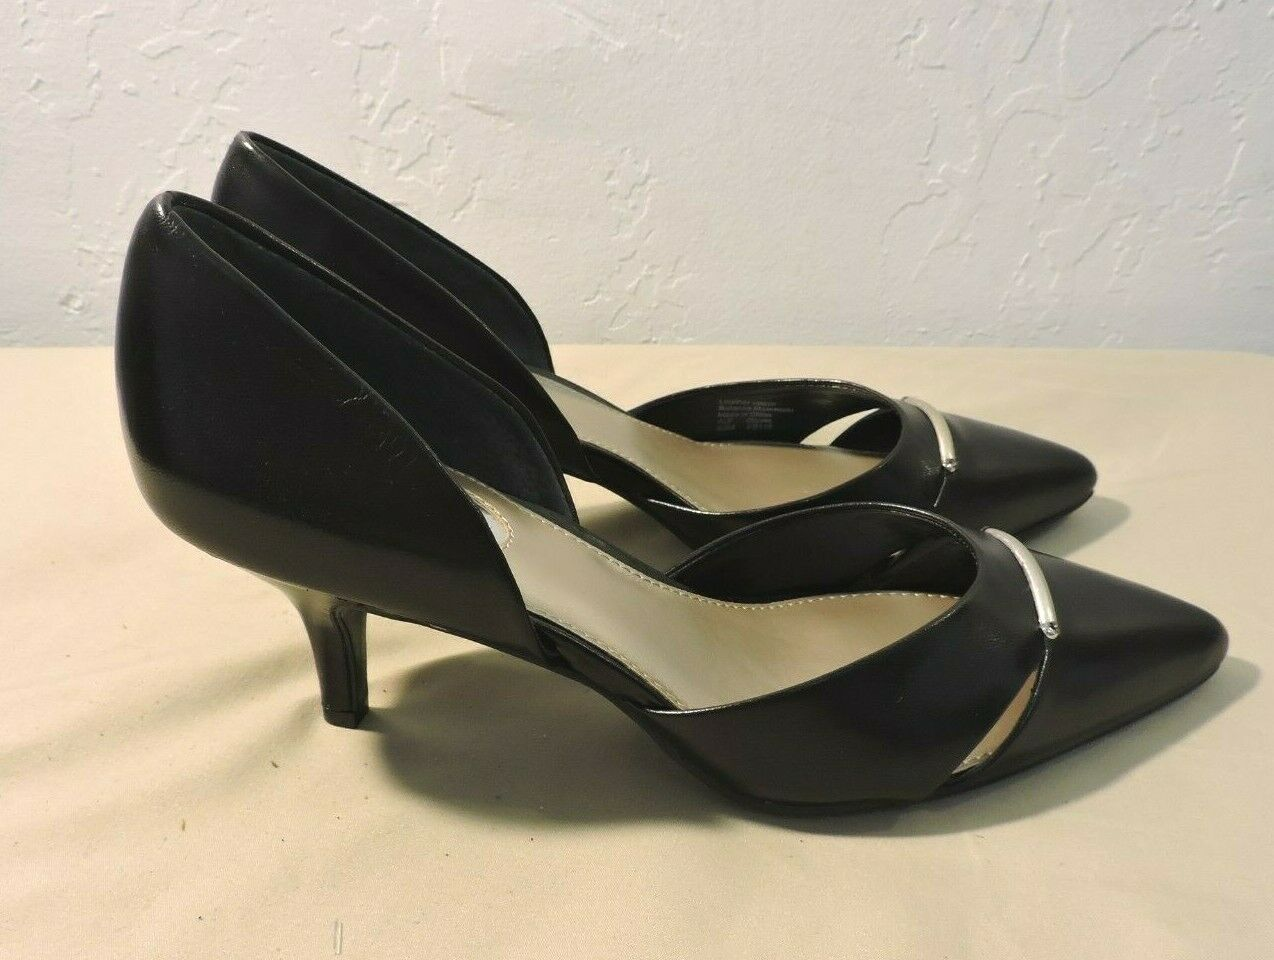 Alfani CORRIN Women's Shoes Heels & Pumps pointed Toe Black Size 8.5 M US